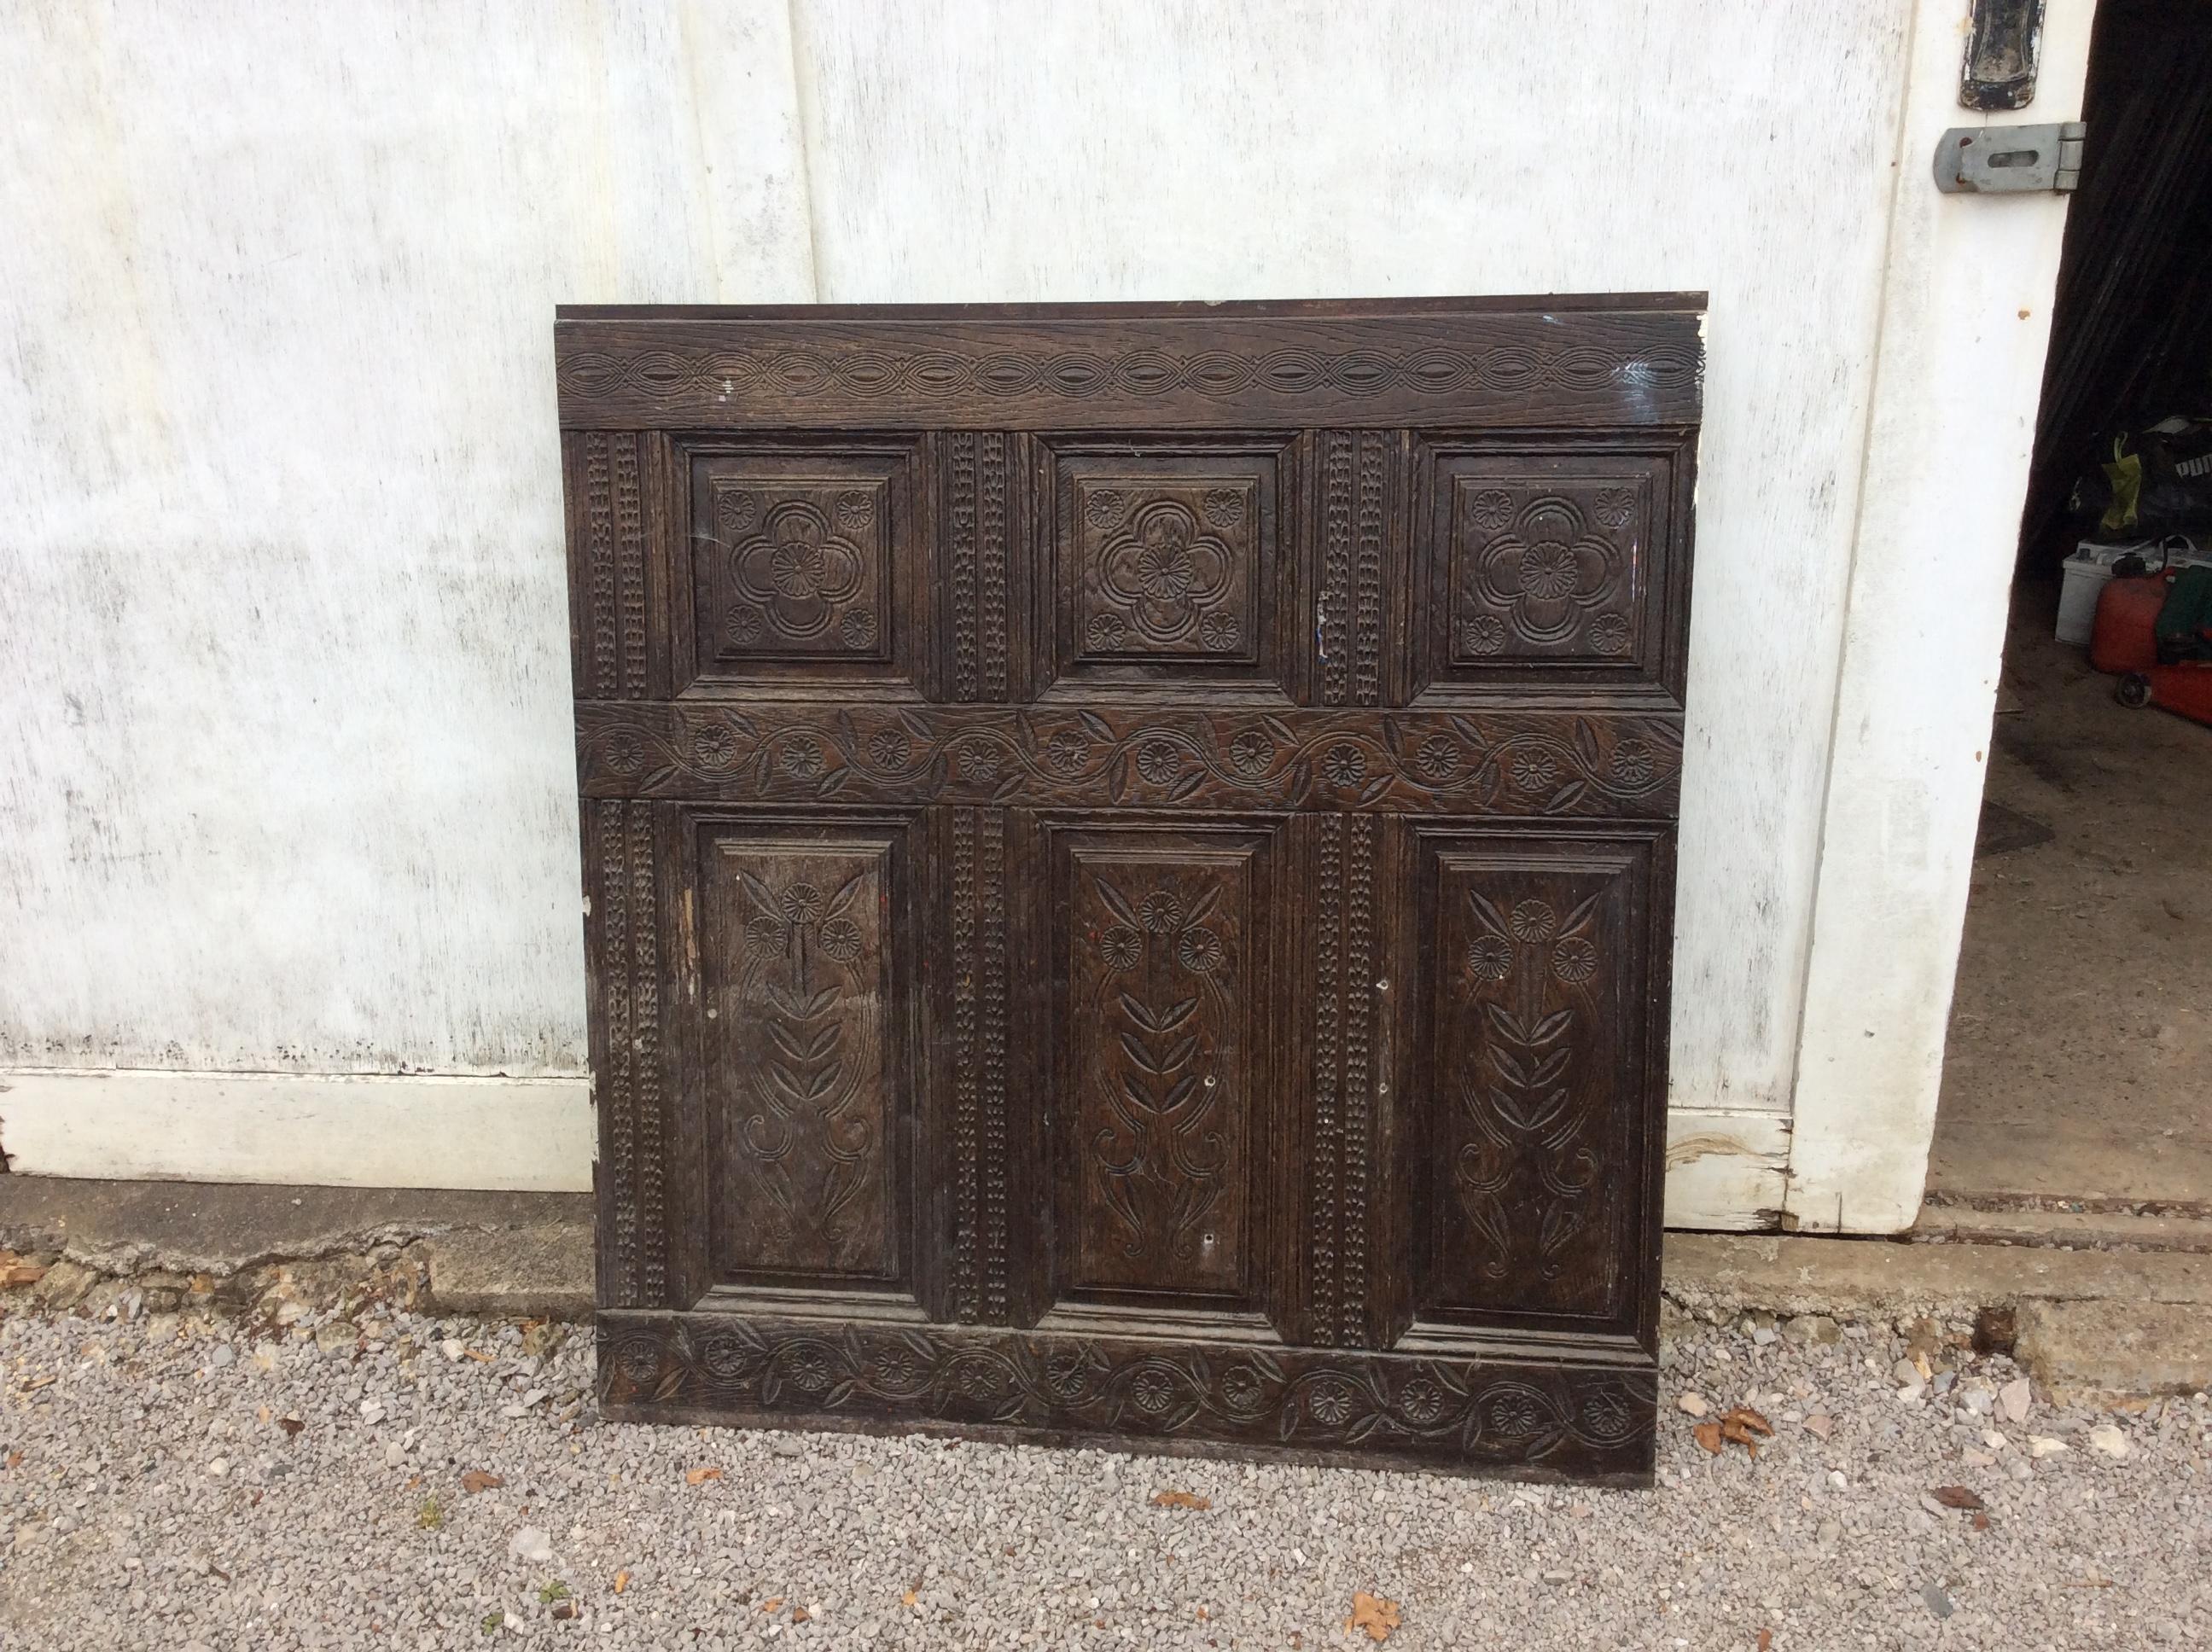 Imitation Oak paneling